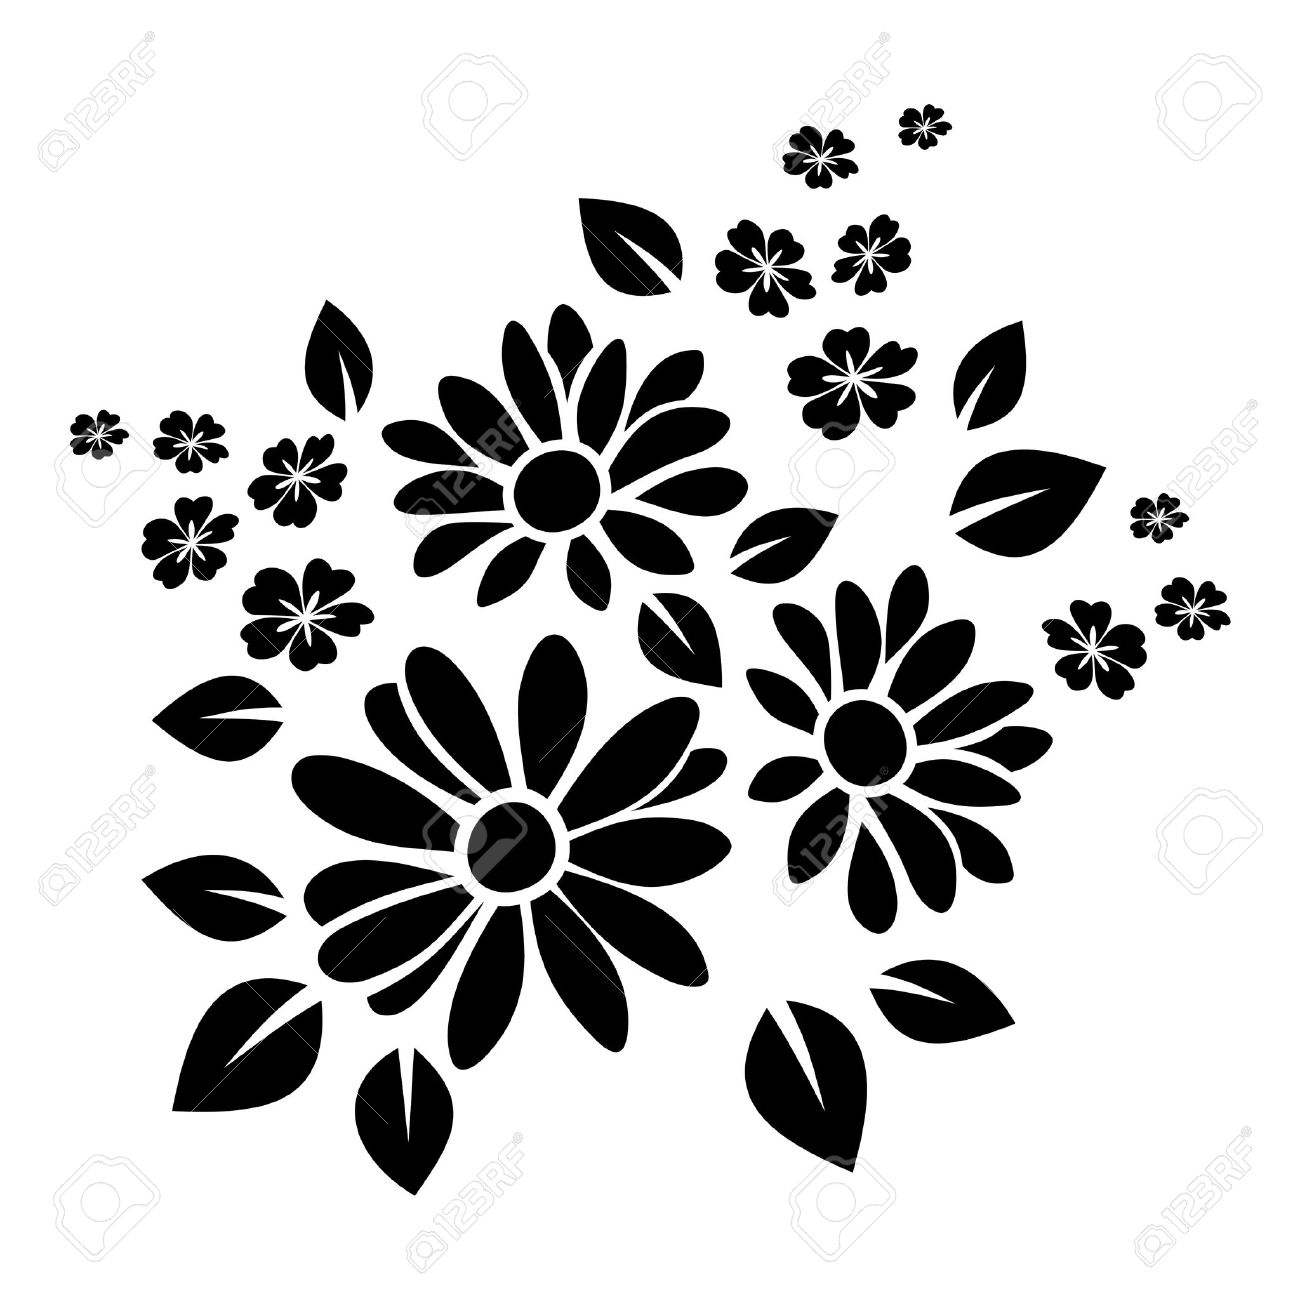 Black silhouette of flowers Vector illustration